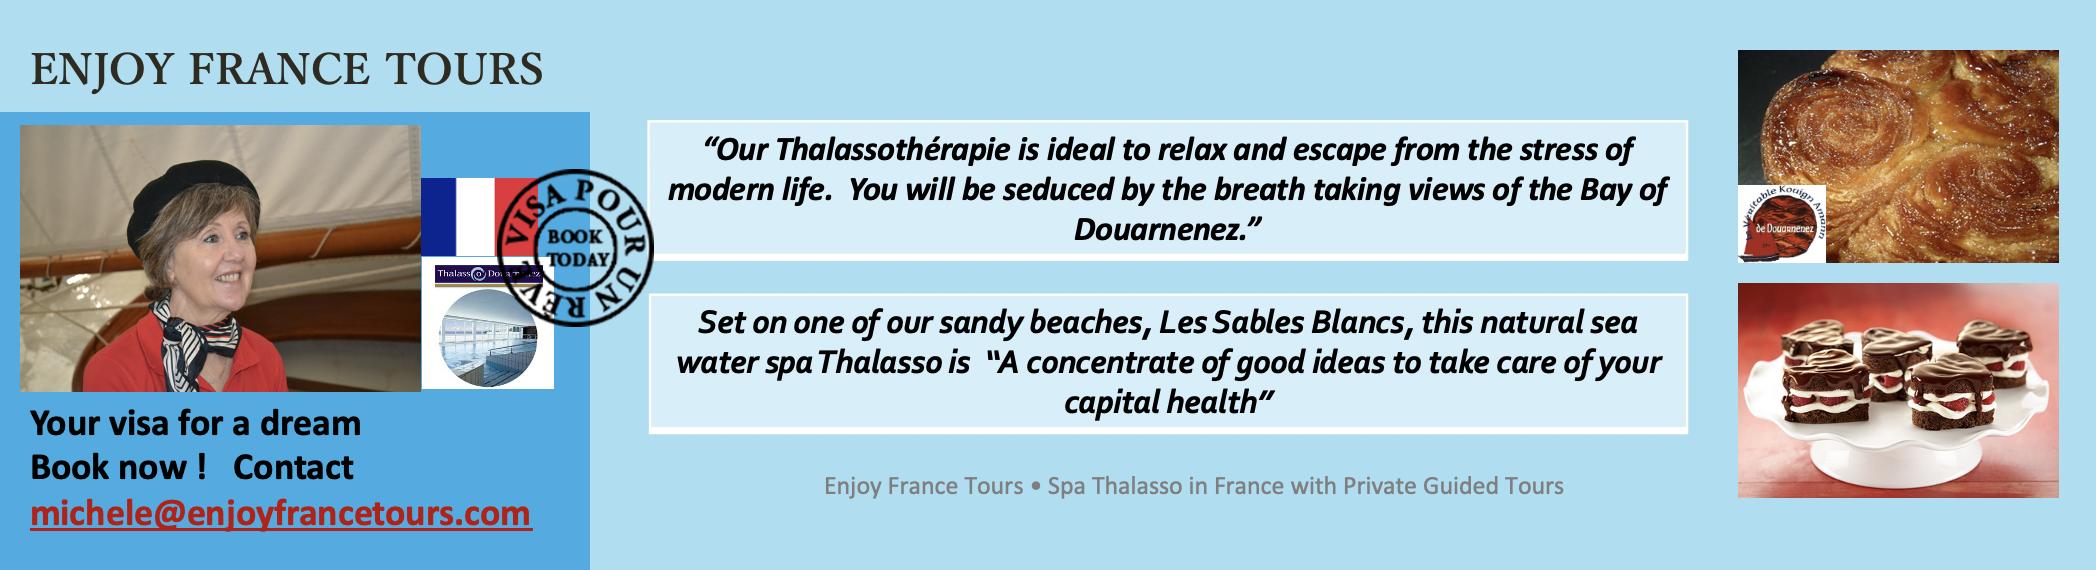 Enjoy France Tours SPA THALASSO Website Pg 4